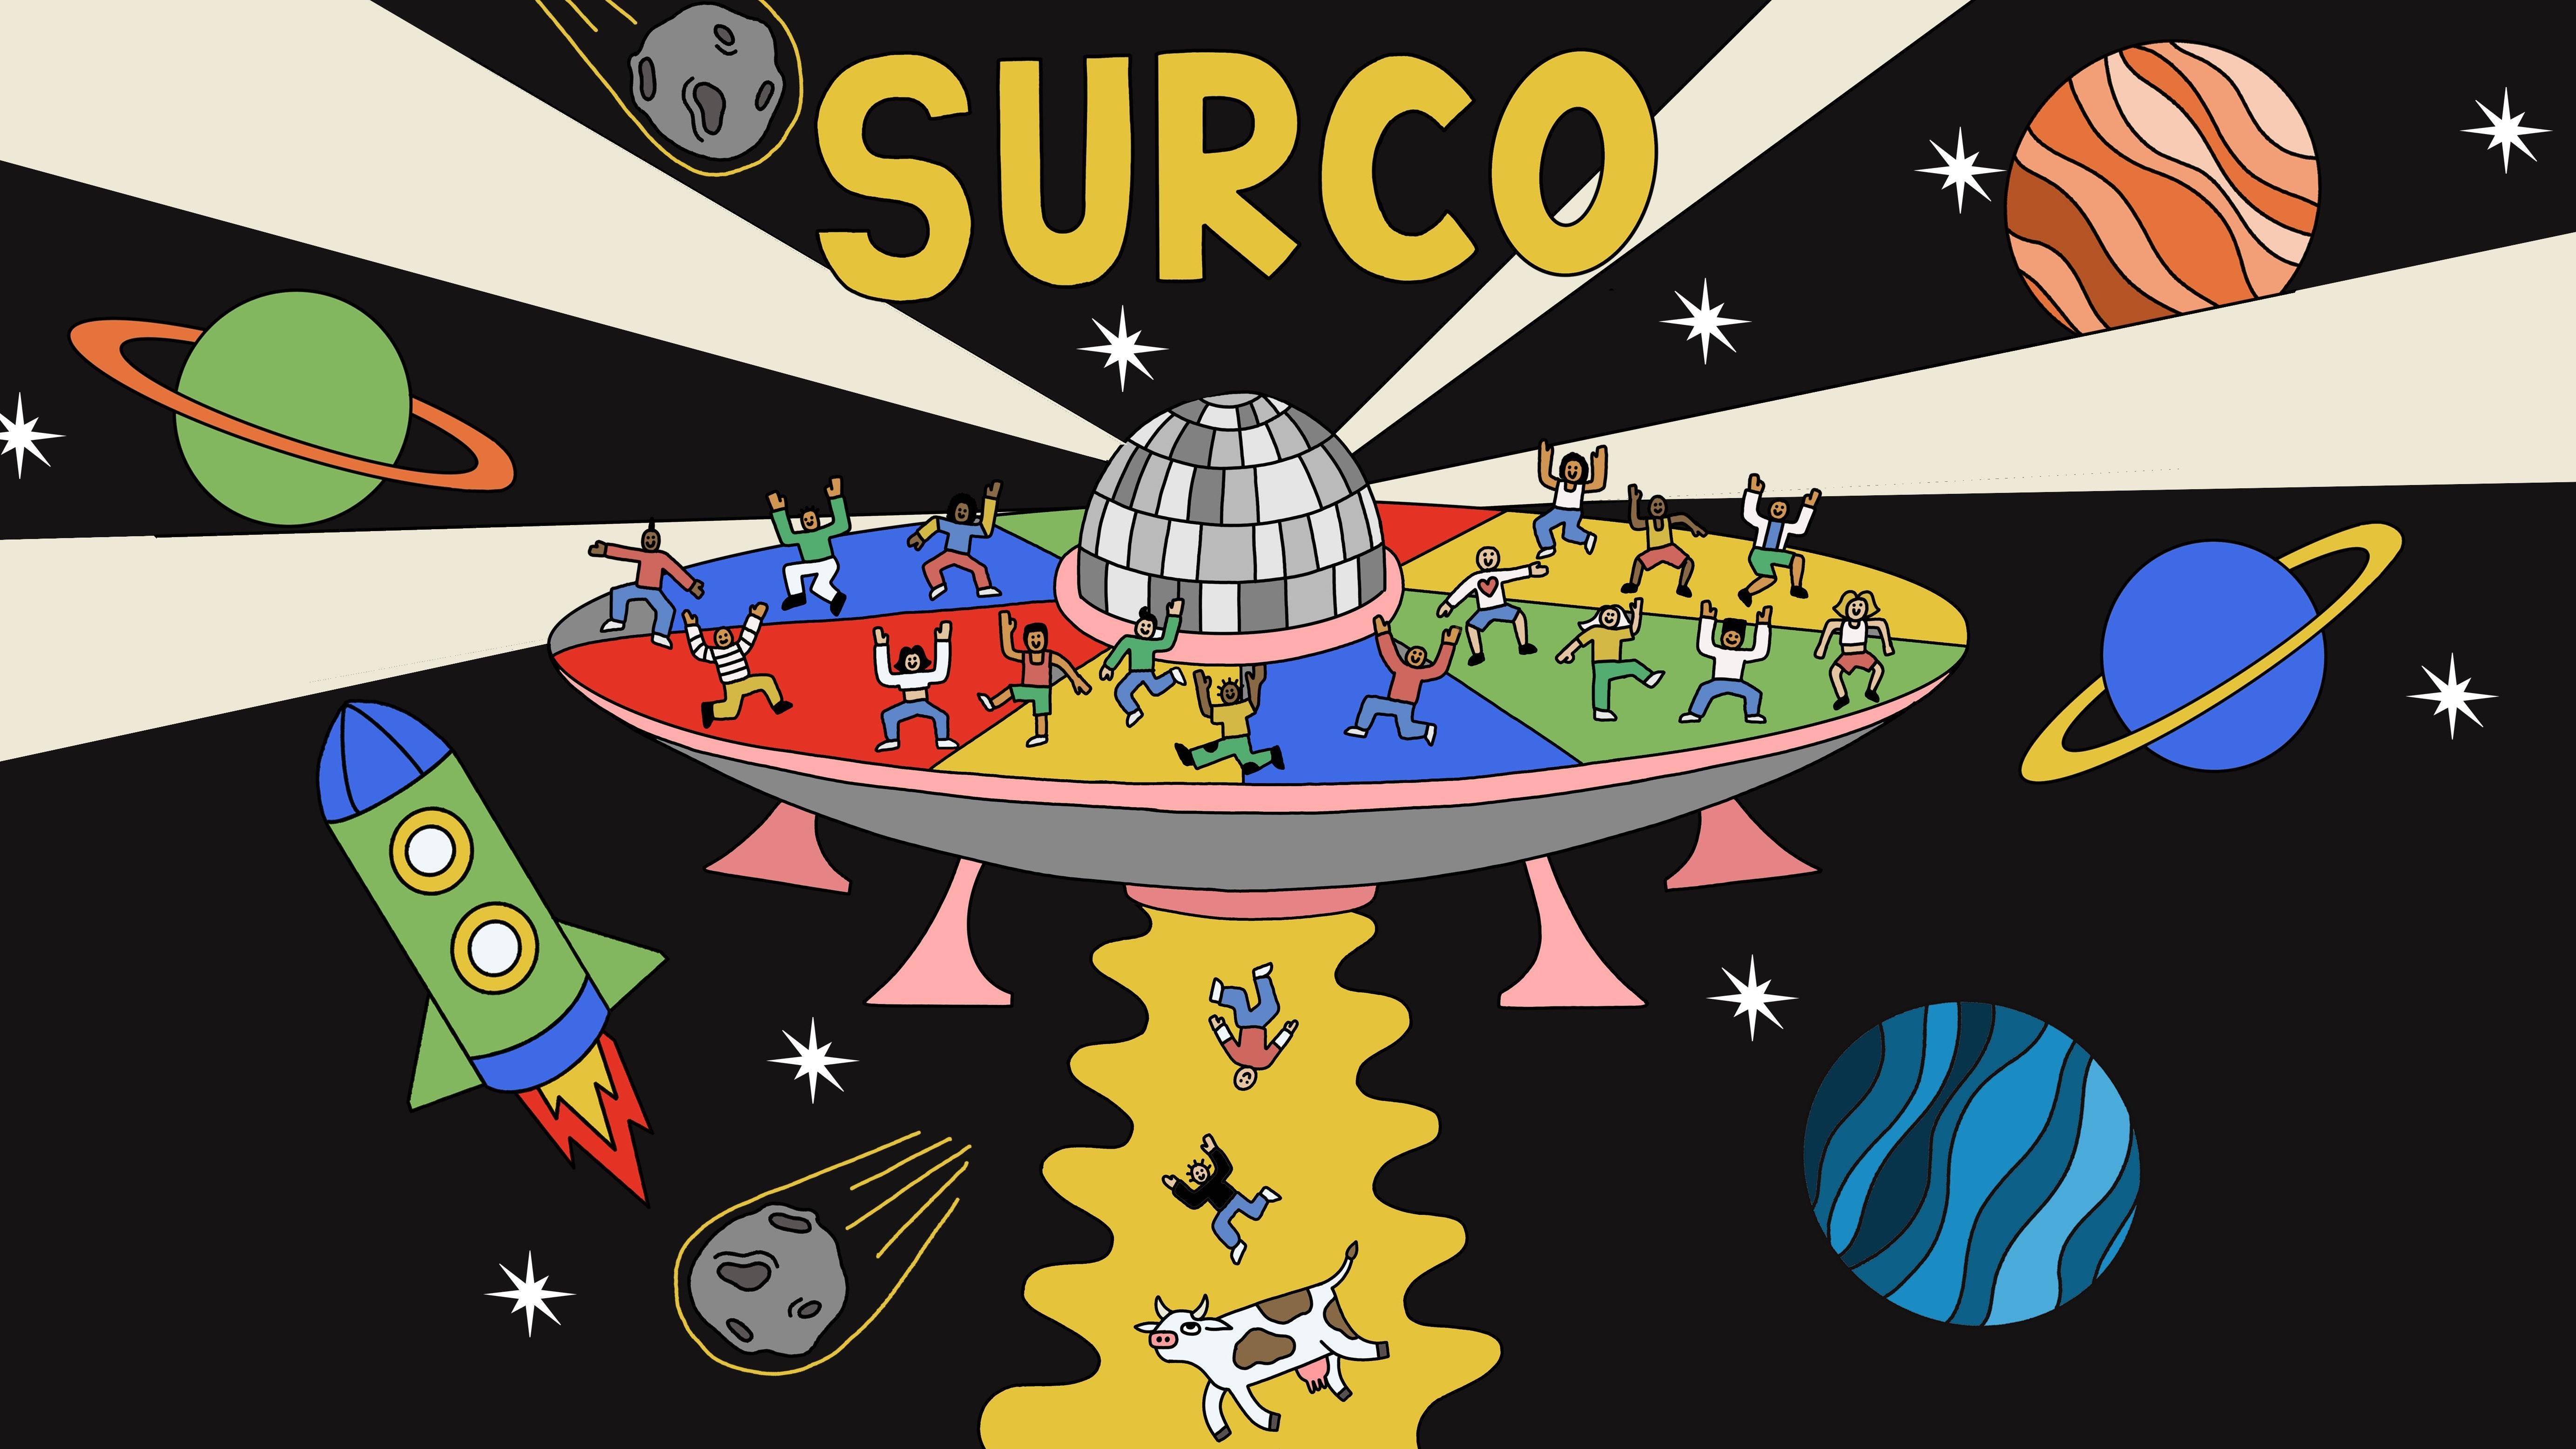 Surco 4th Birthday: Late Nite Tuff Guy